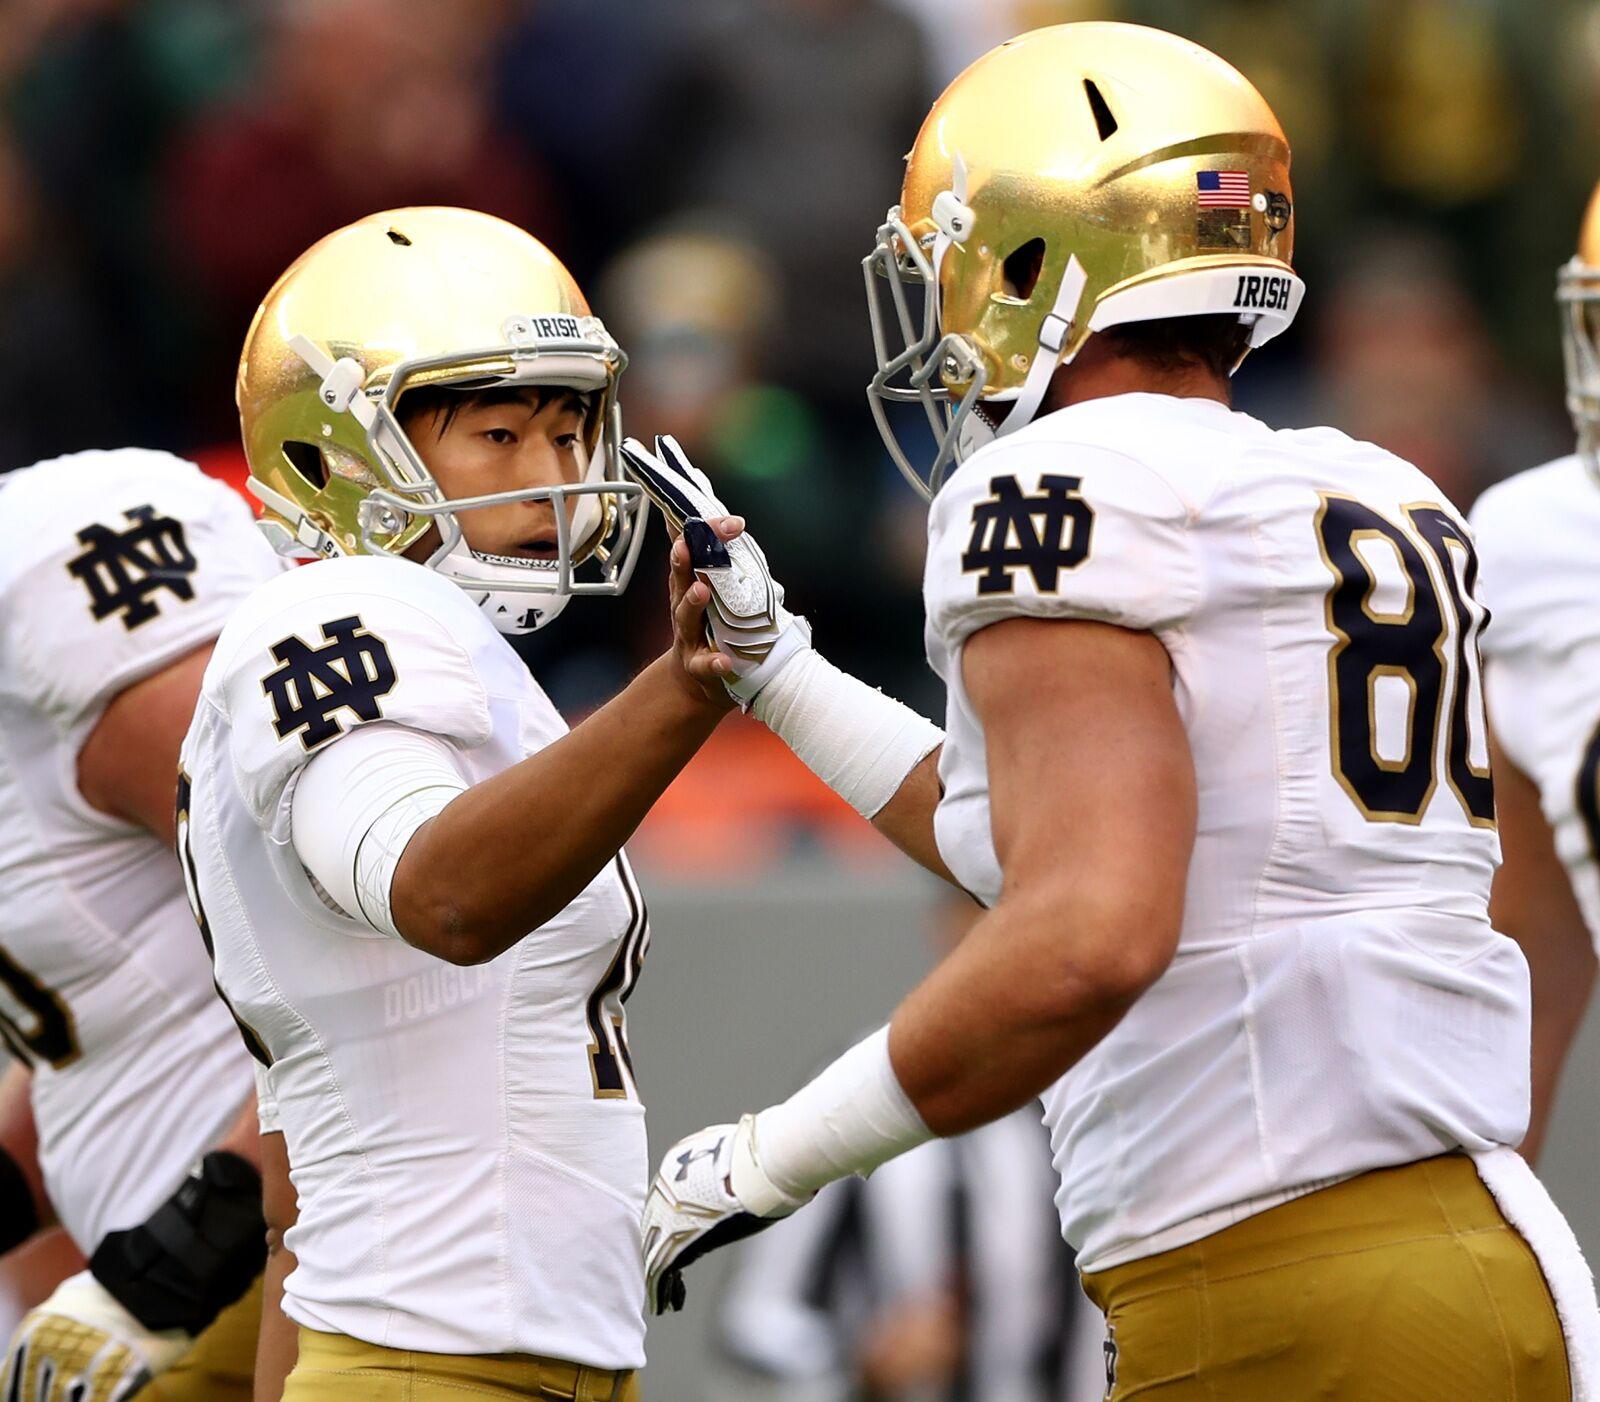 Notre Dame Draft Watch: Justin Yoon to the Bears makes sense